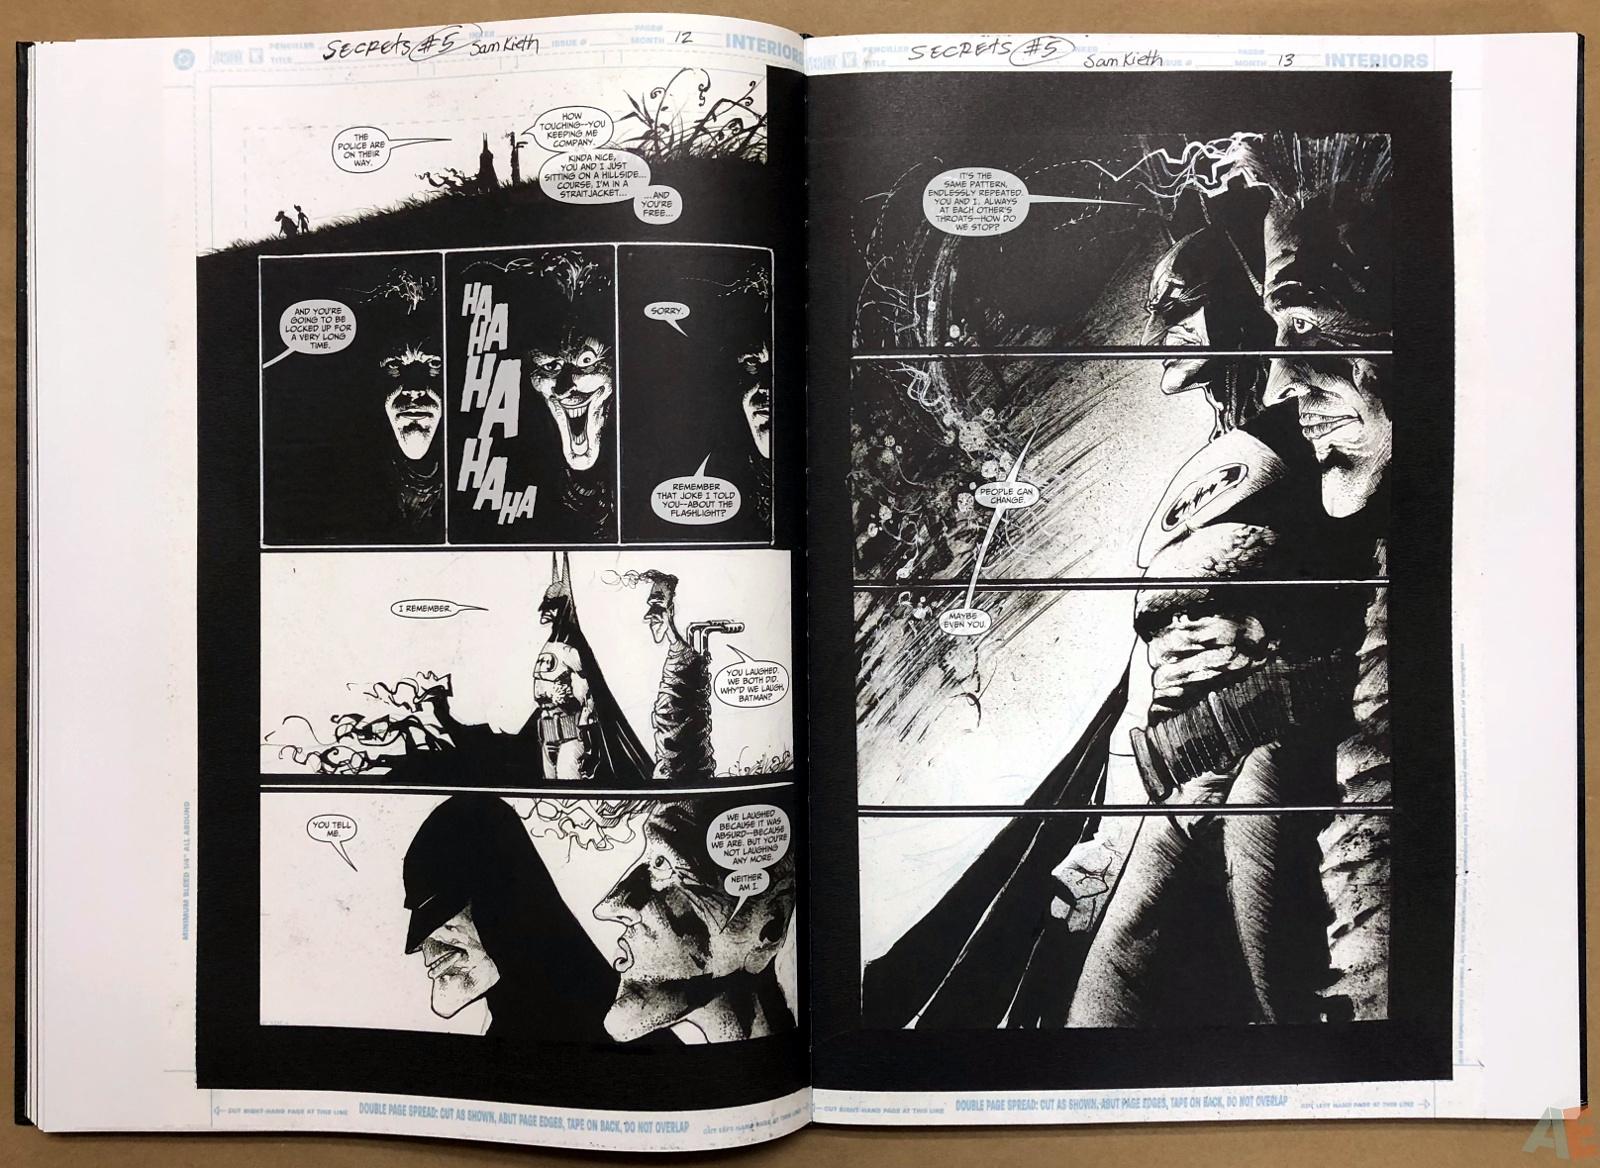 Batman: Secrets – Sam Kieth Gallery Edition 29